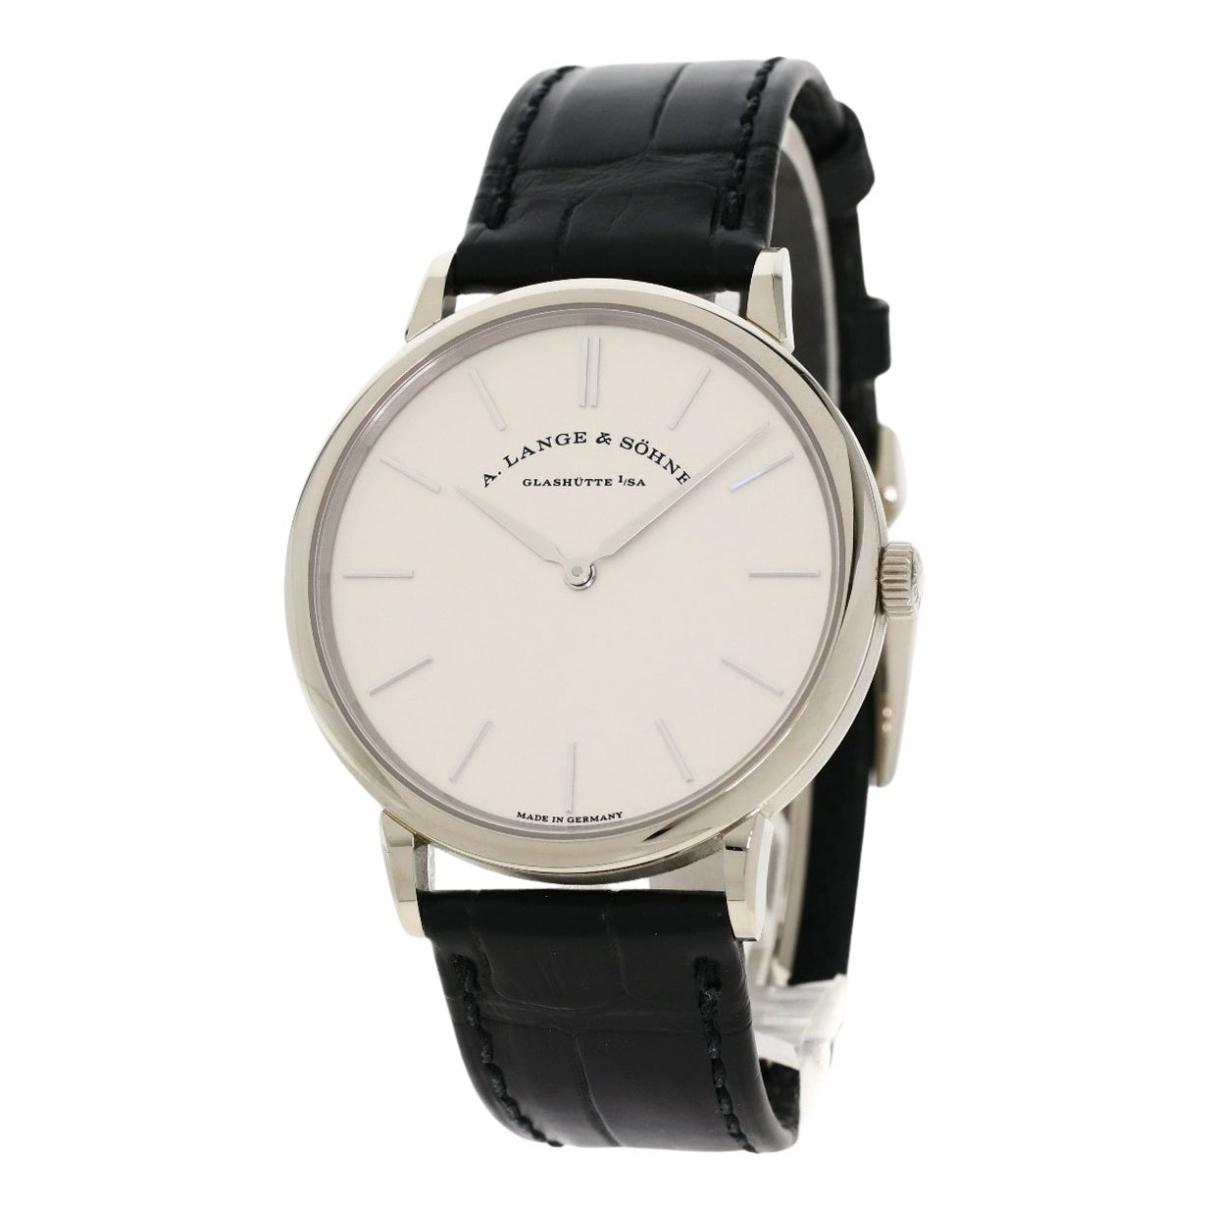 Relojes de Oro blanco A. Lange & Sohne